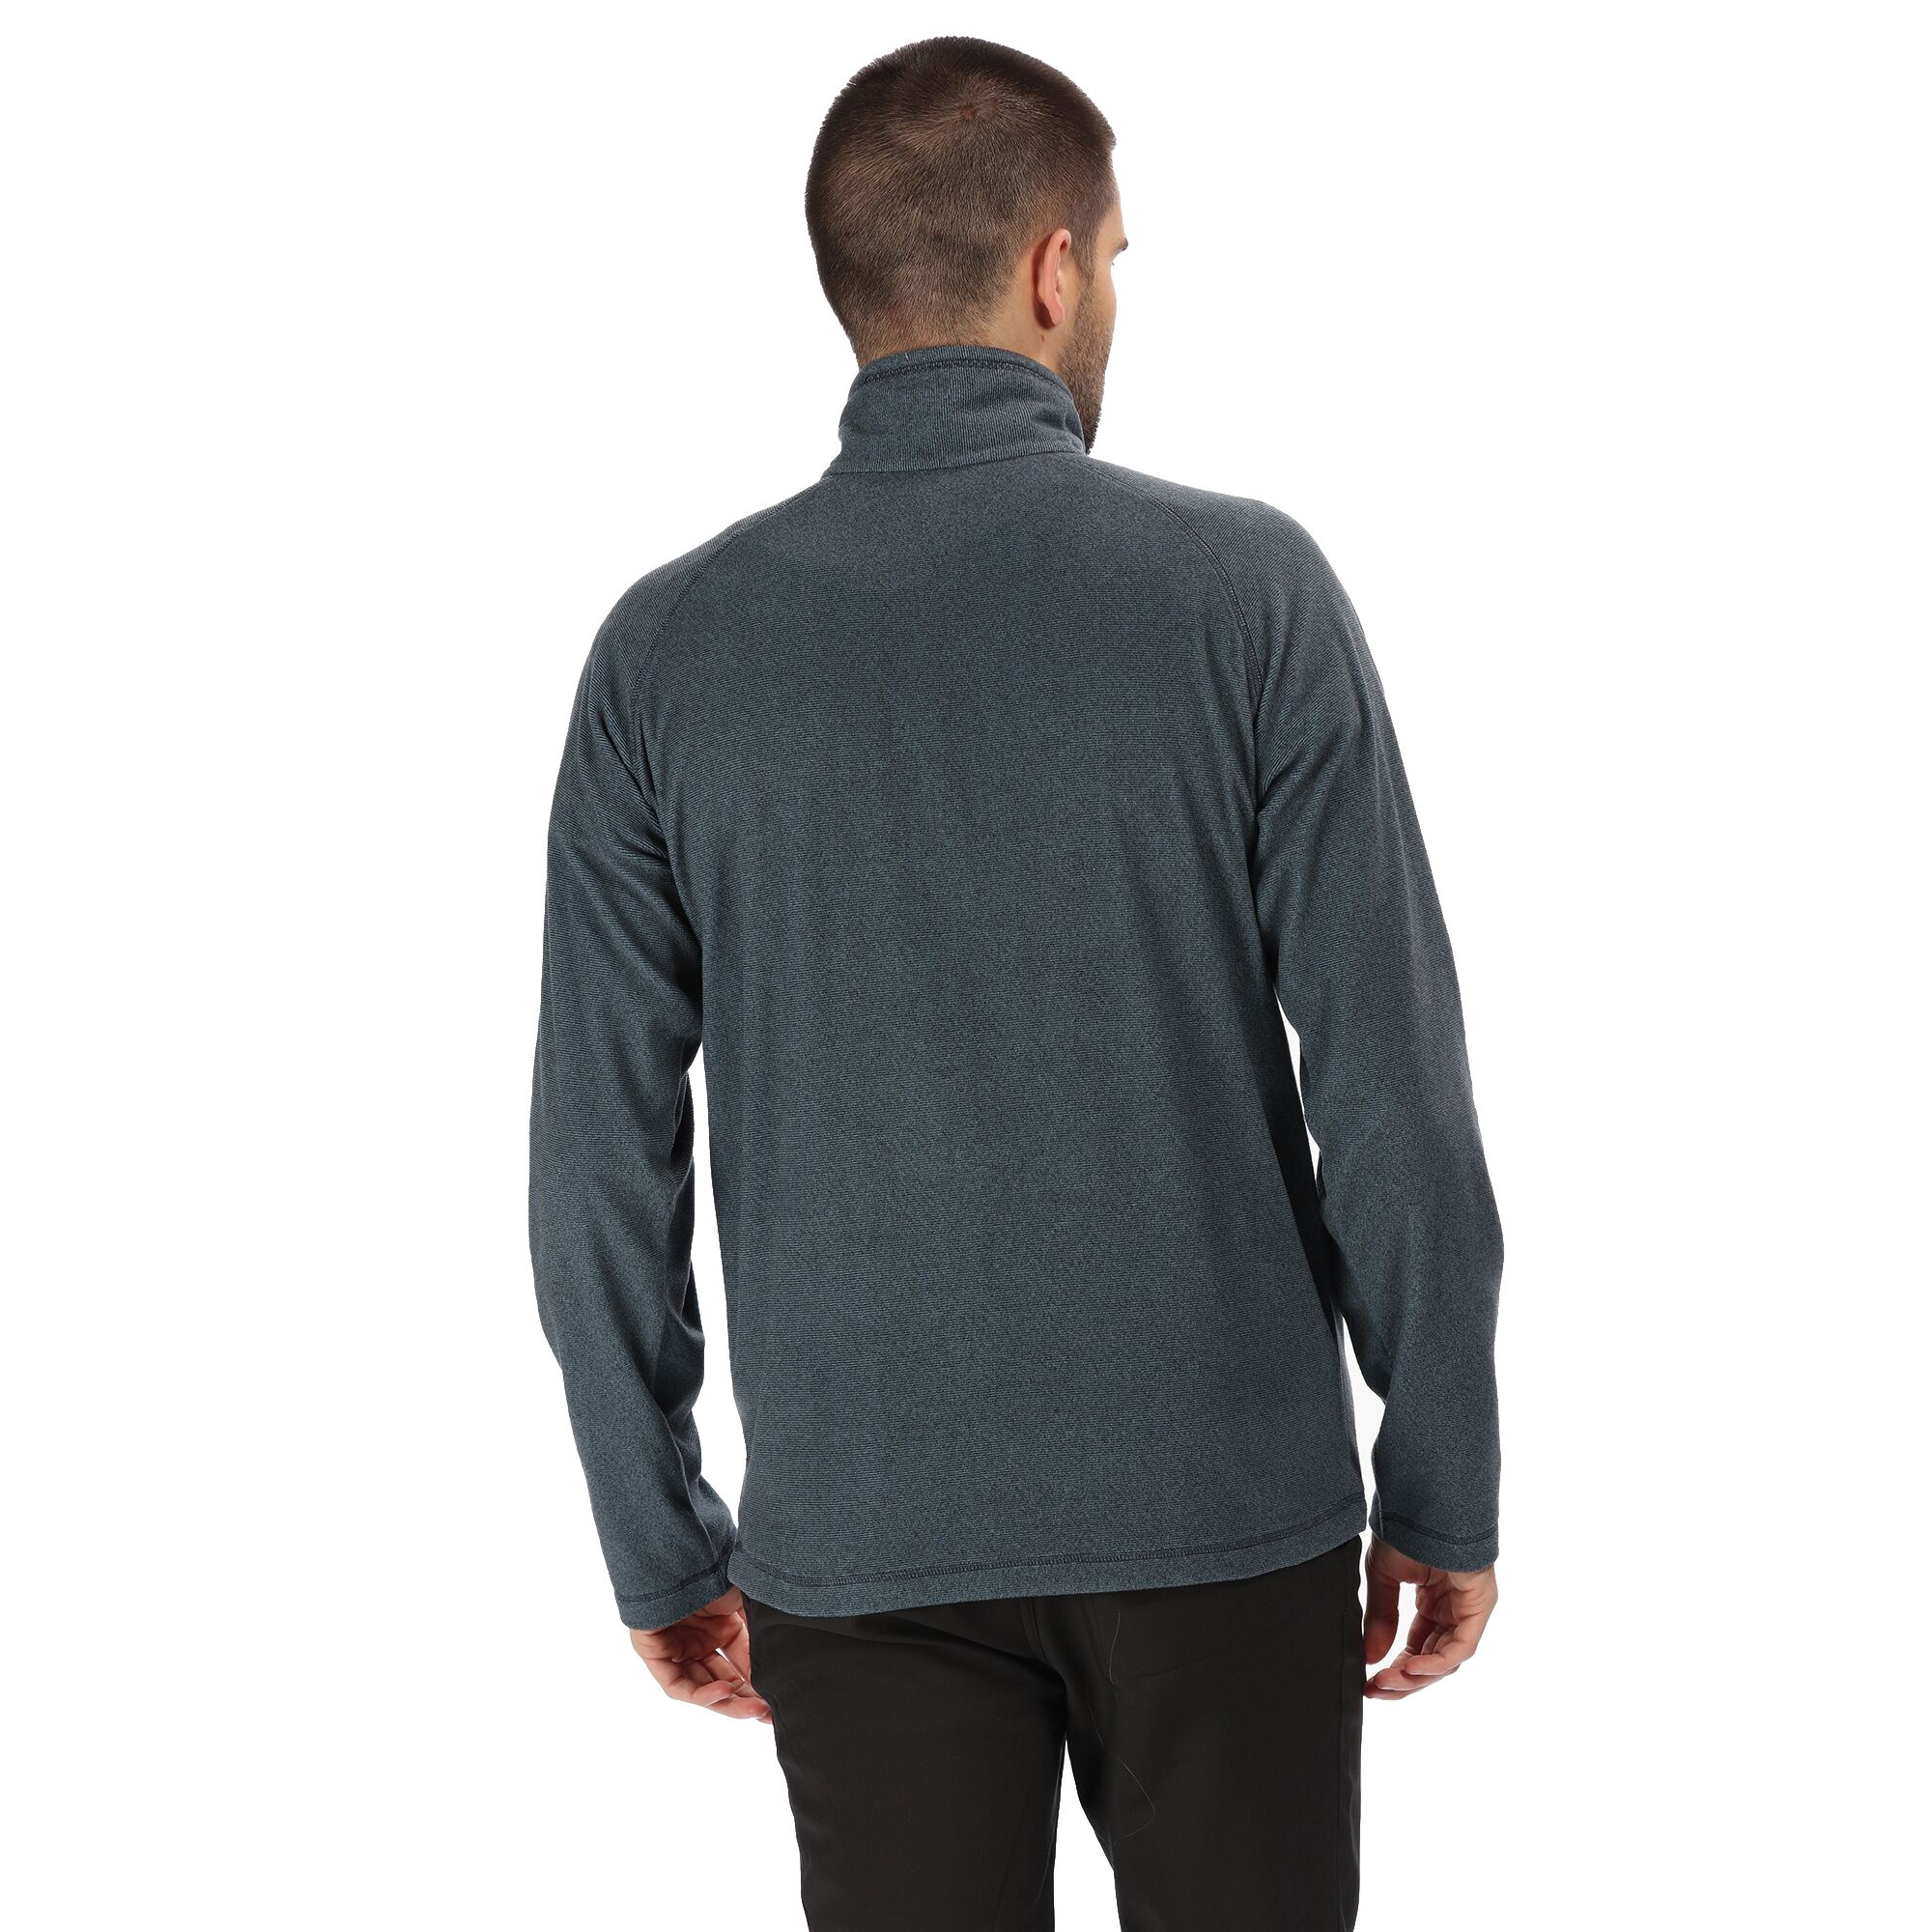 Regatta-Mens-Fleece-Jacket-Massive-Clearance-RRP-60-00 thumbnail 5